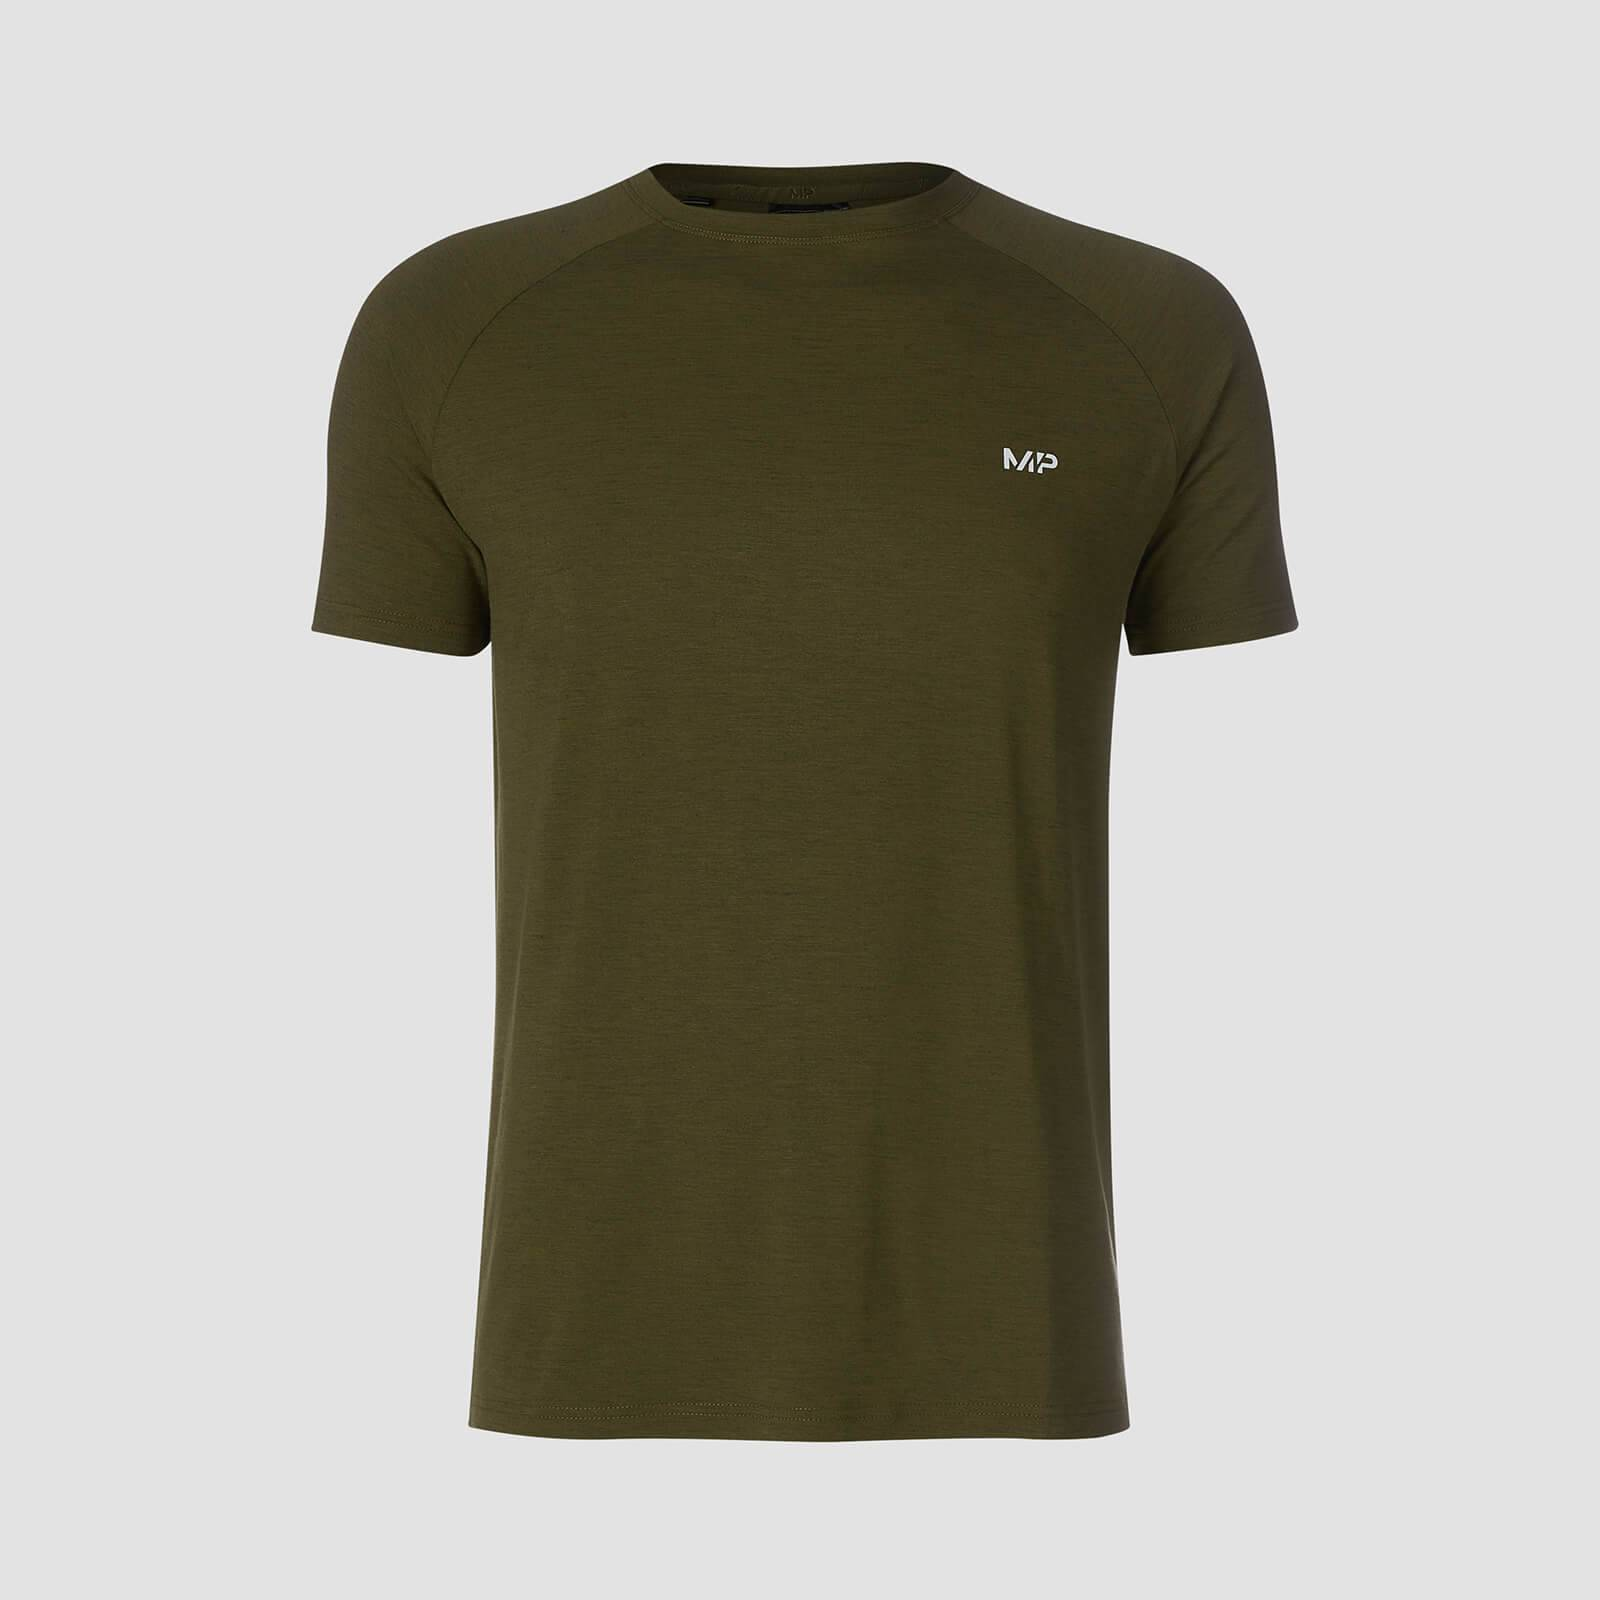 Mp Performance Short Sleeve T-Shirt - Army Green/sort - M